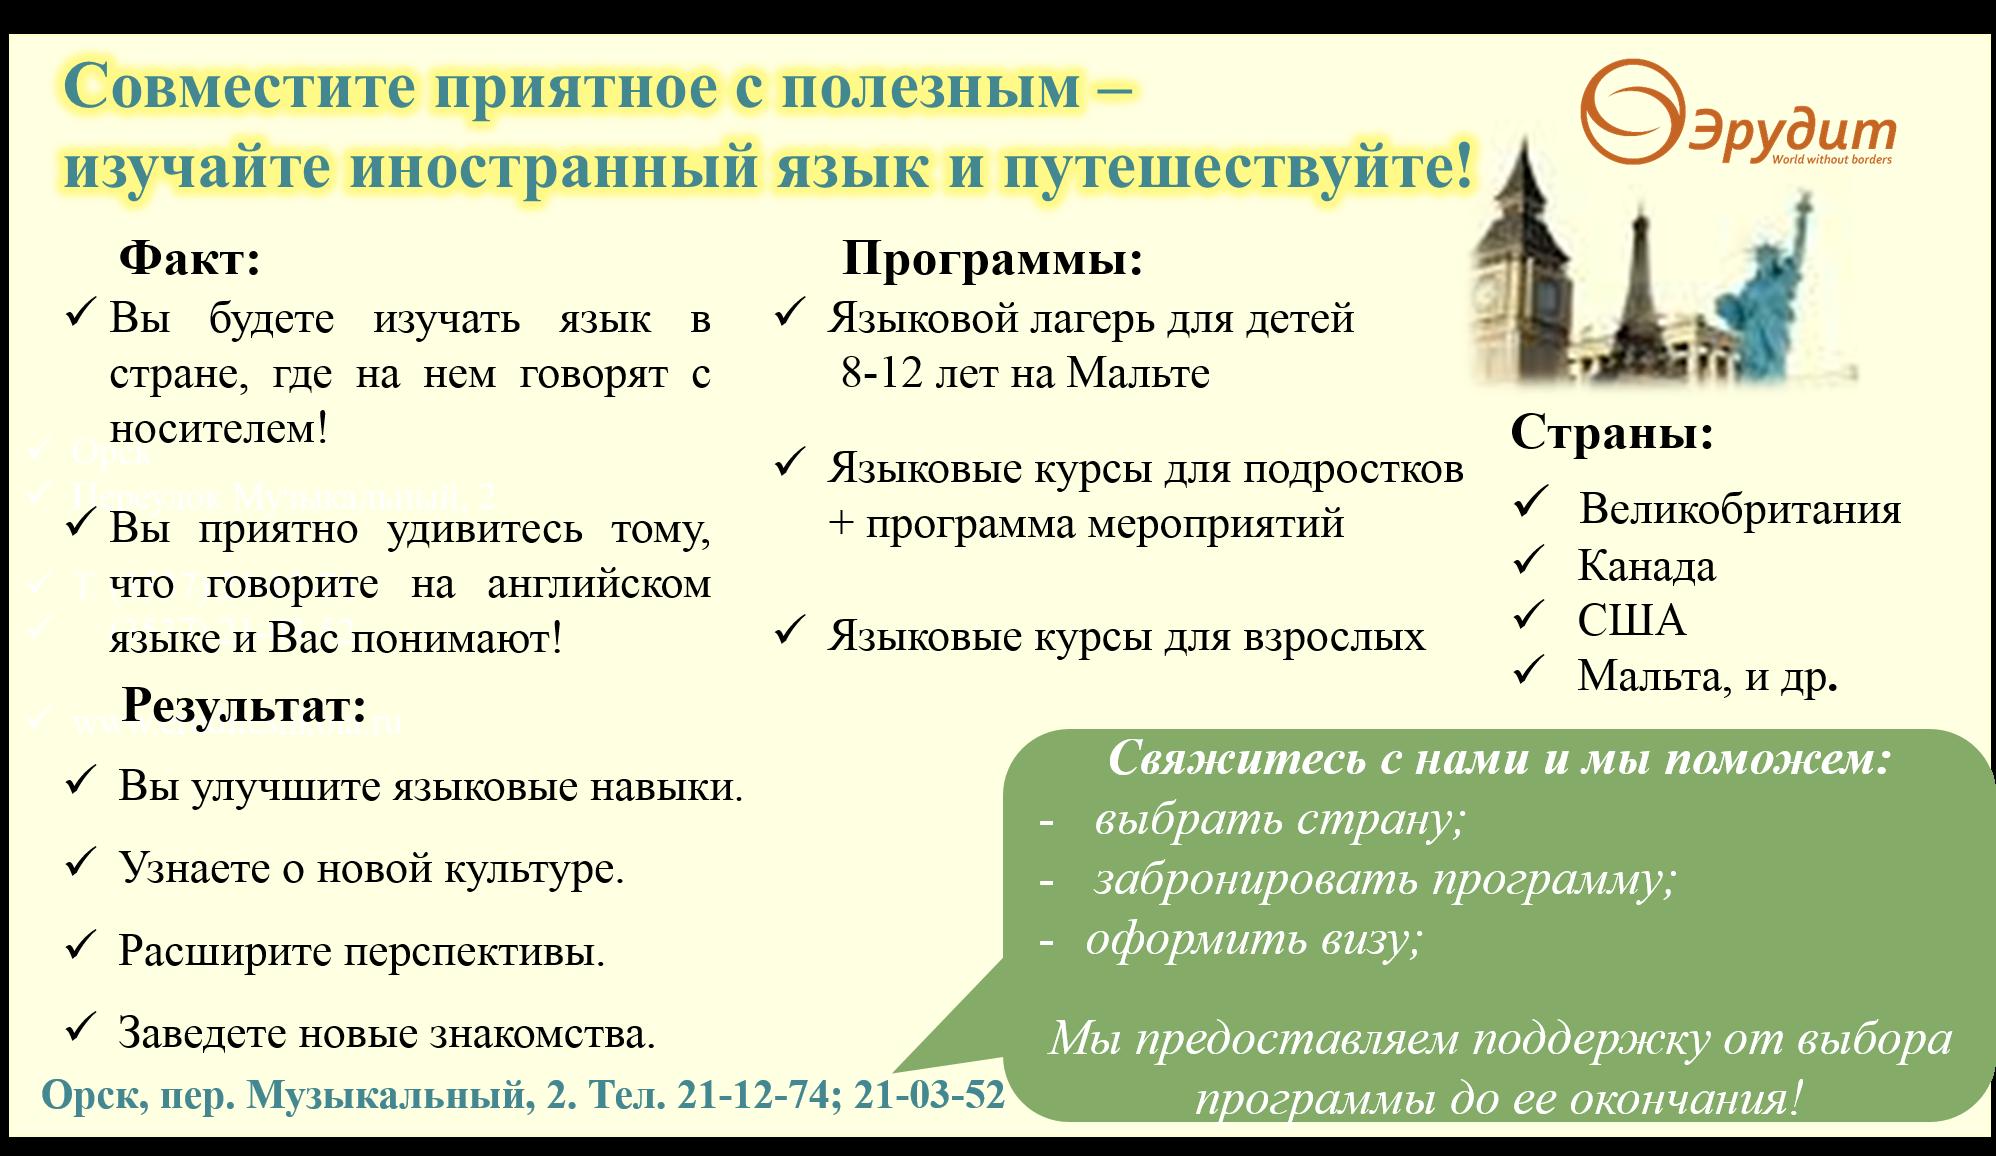 языковые курсы за рубежом Эрудит, Орск, Гай